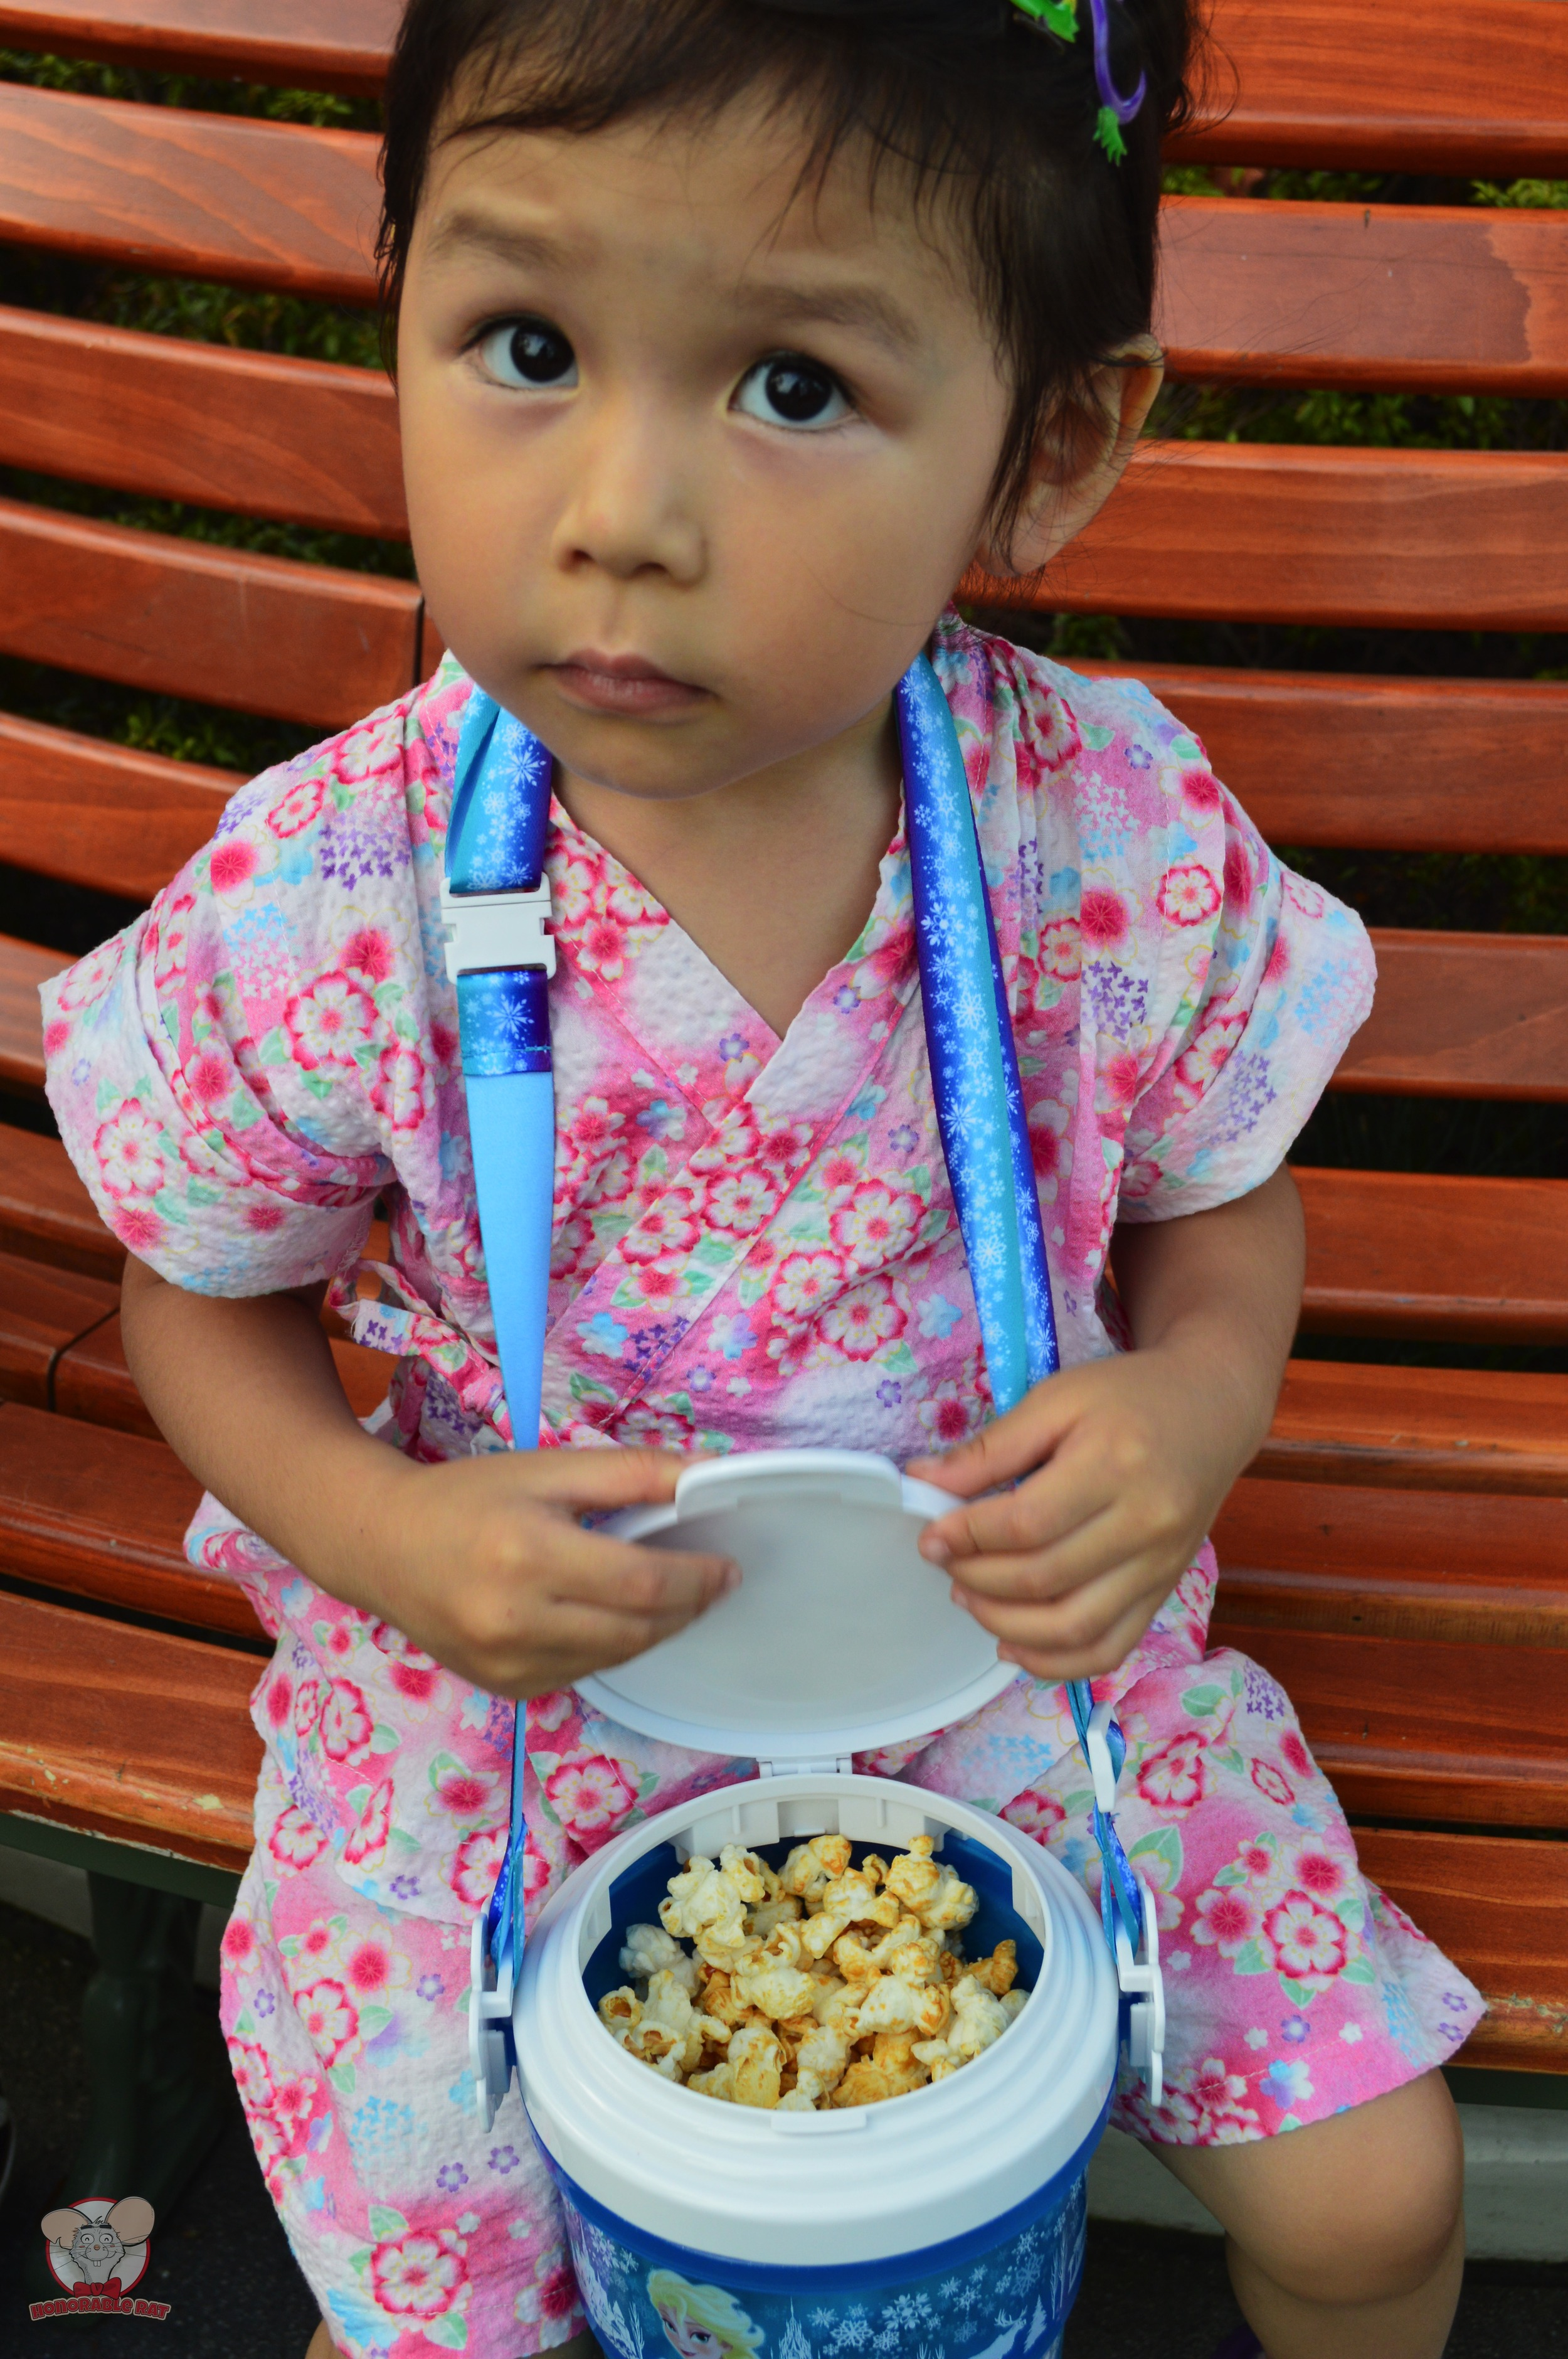 Little Mahina opening the popcorn bucket